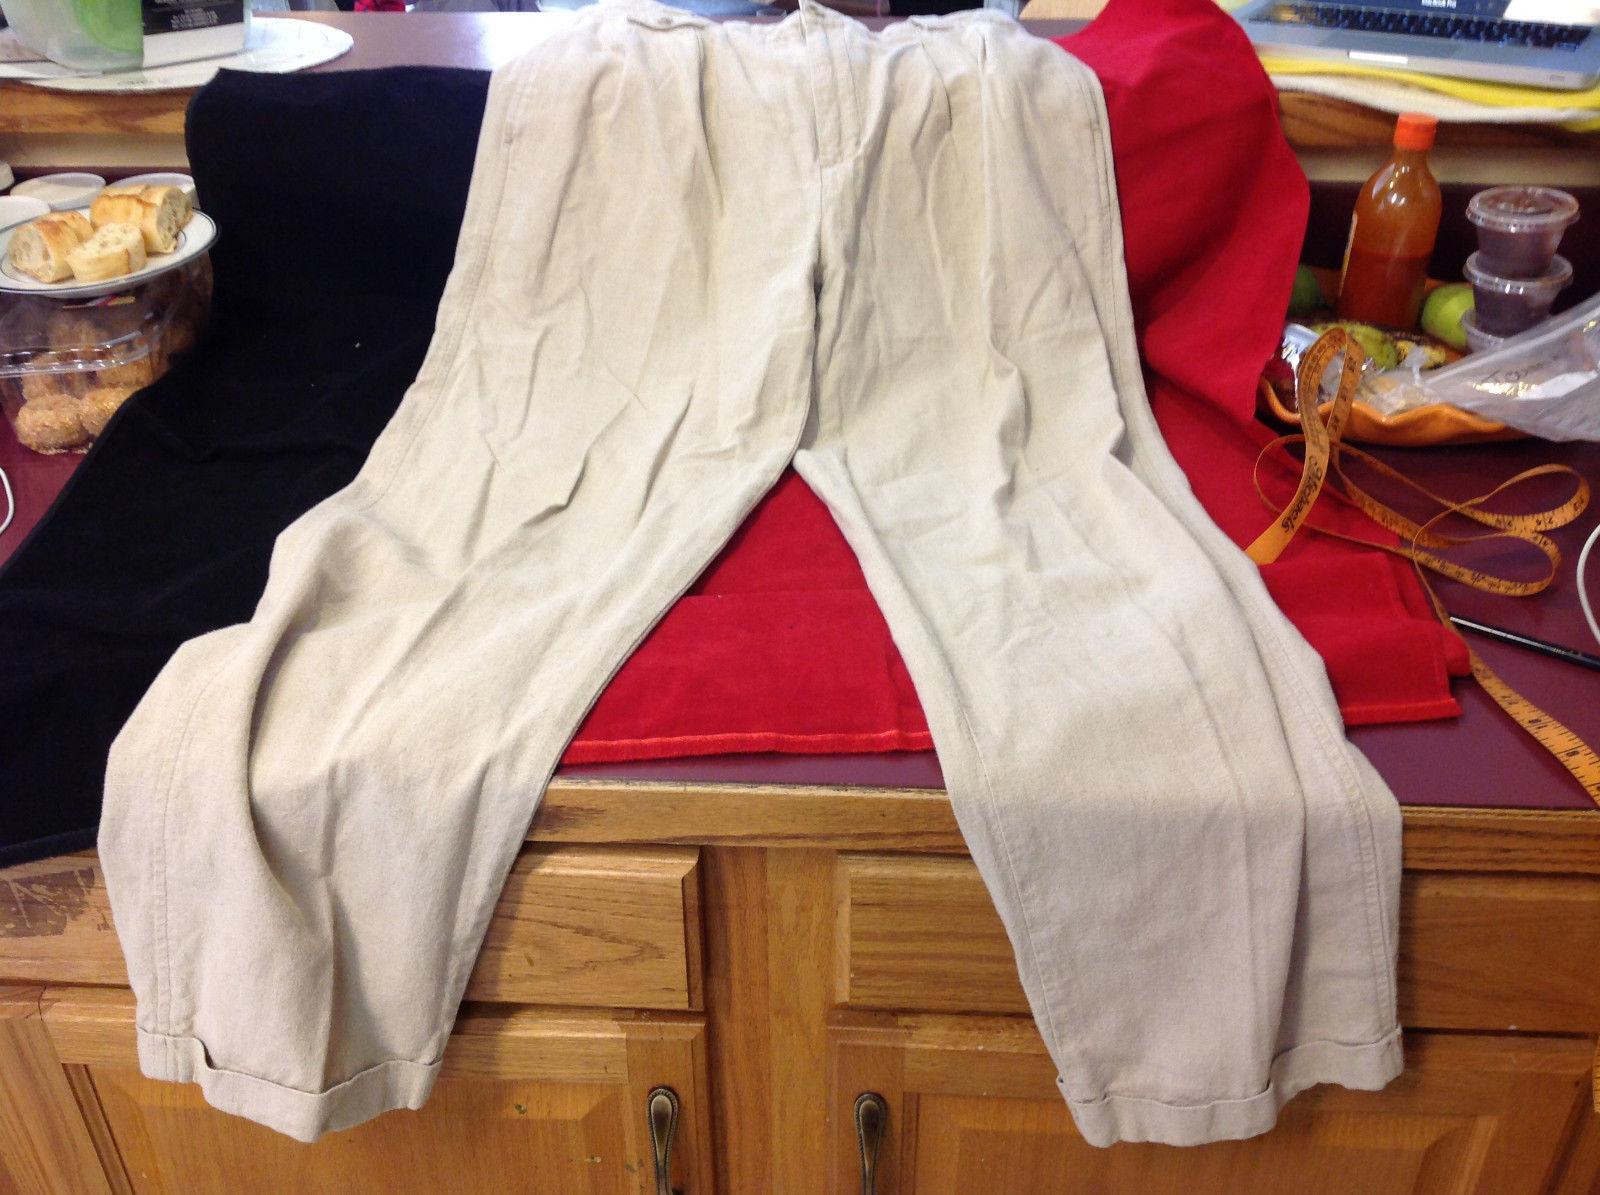 Baxter Brand Mens Formal Slacks Pants Tan Light Brown Khakis size 34